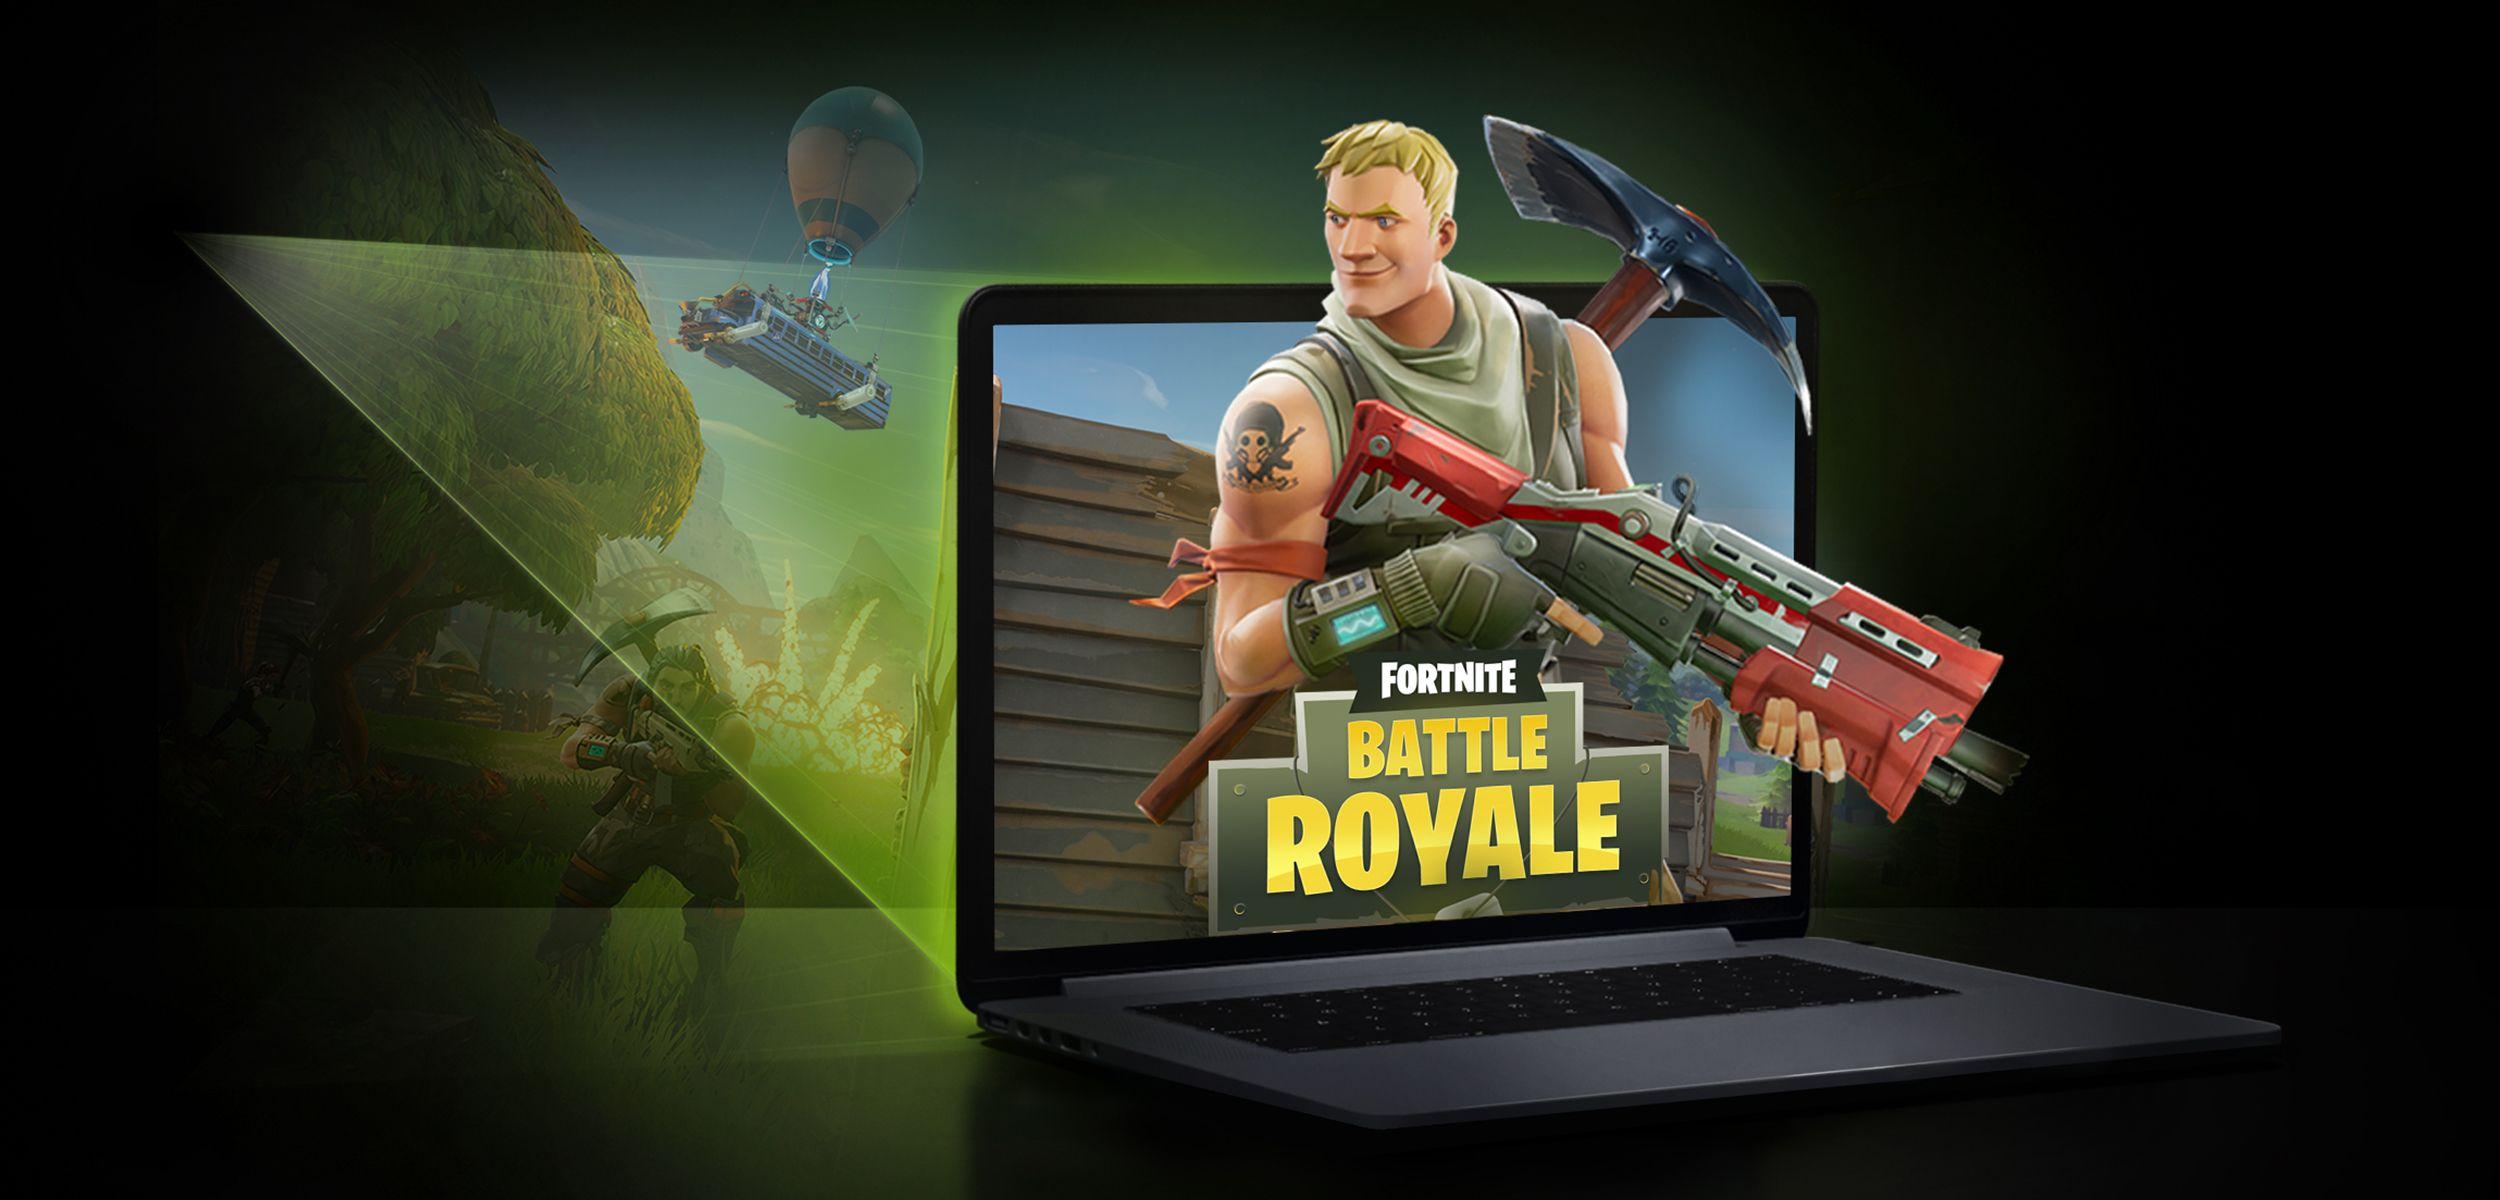 controladores Nvidia 390.65